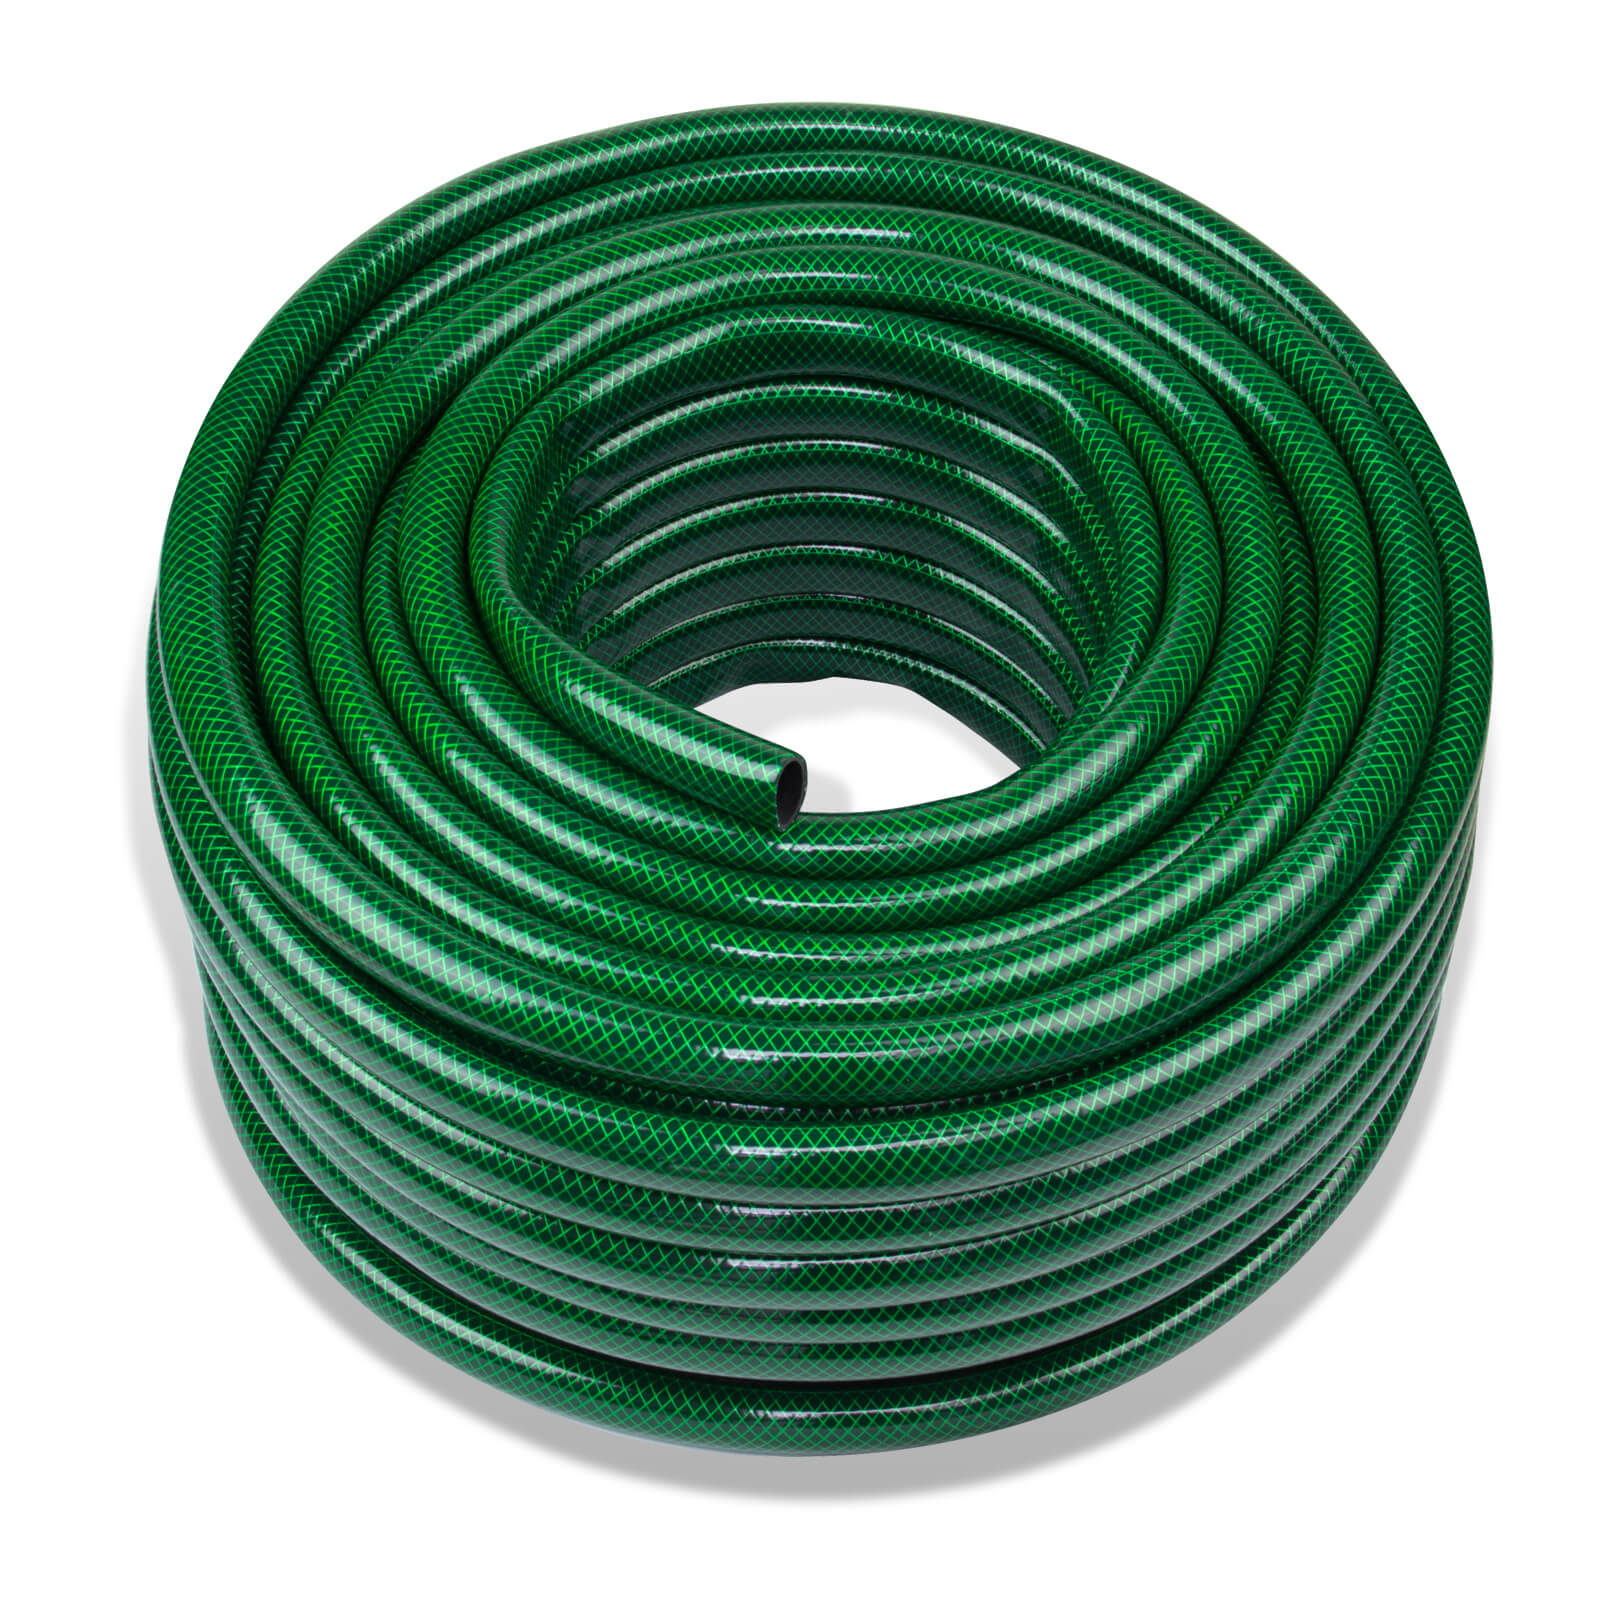 Stabilo-Sanitaer Gartenschlauch / PVC Wasserschlauch 3/4 Zoll - 50 m - grün - 3-lagig 14455